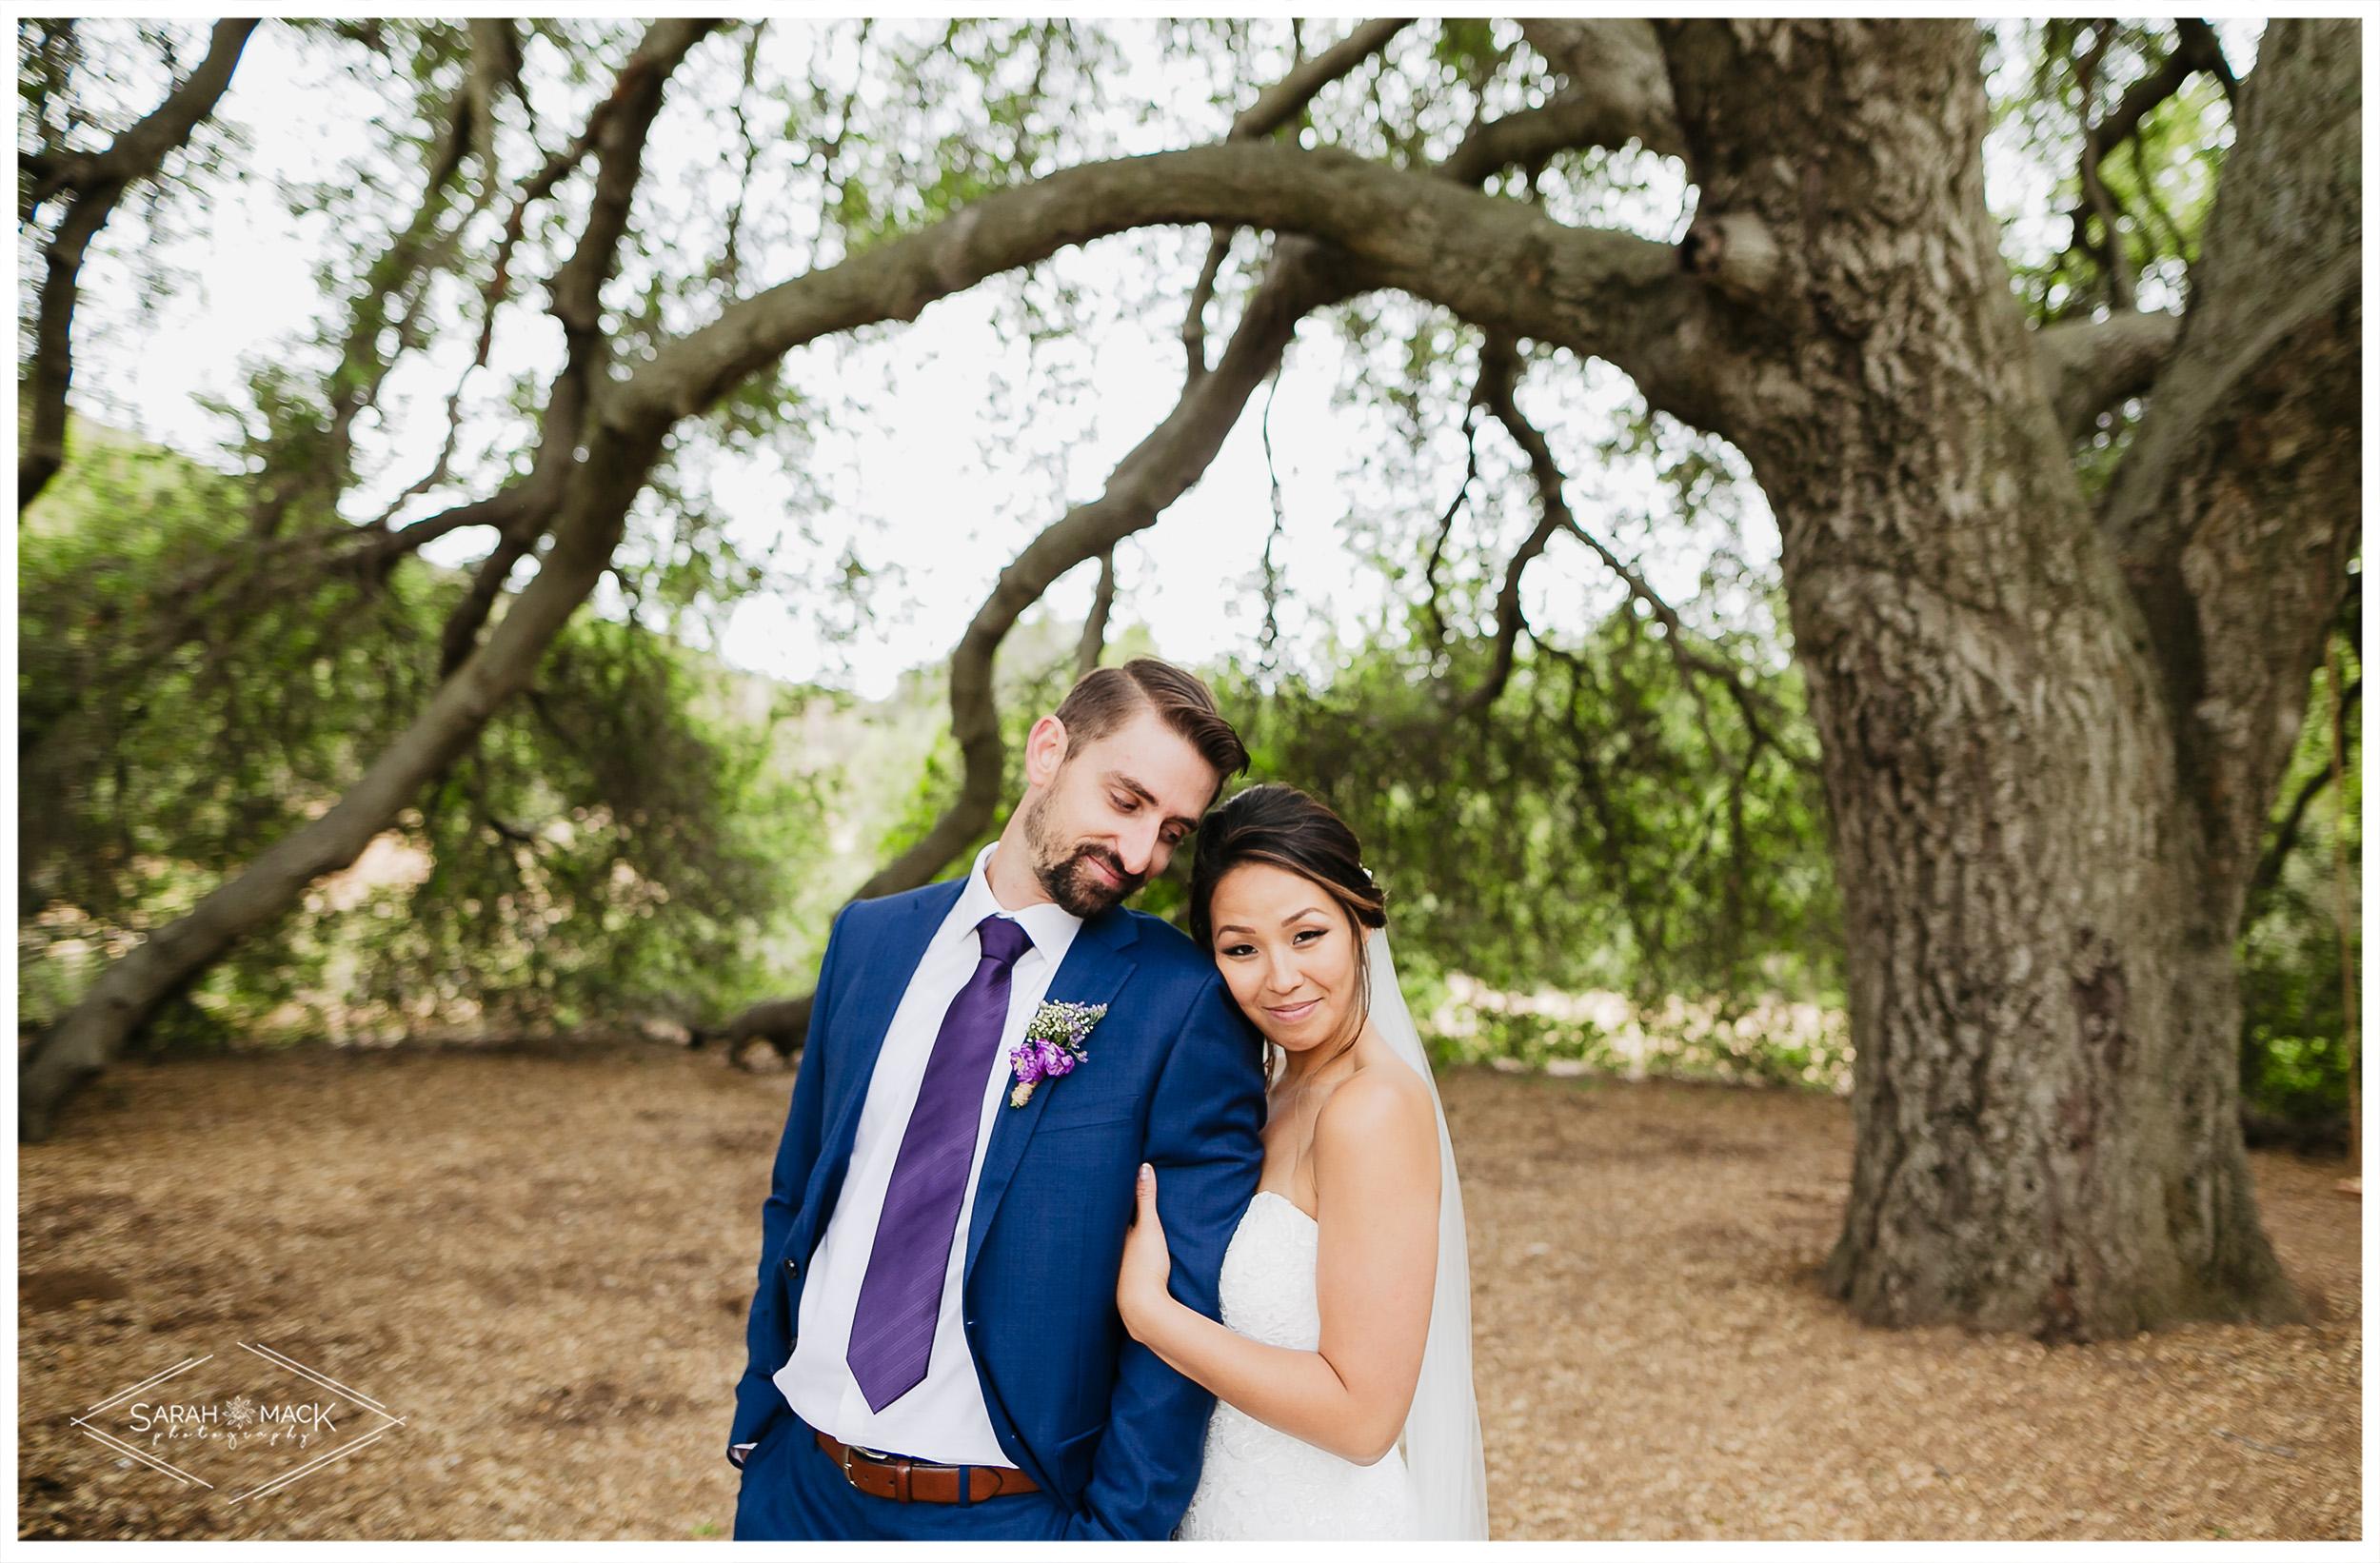 PG-Owl-Creek-Farms-Temecula-Wedding-Photography-47.jpg